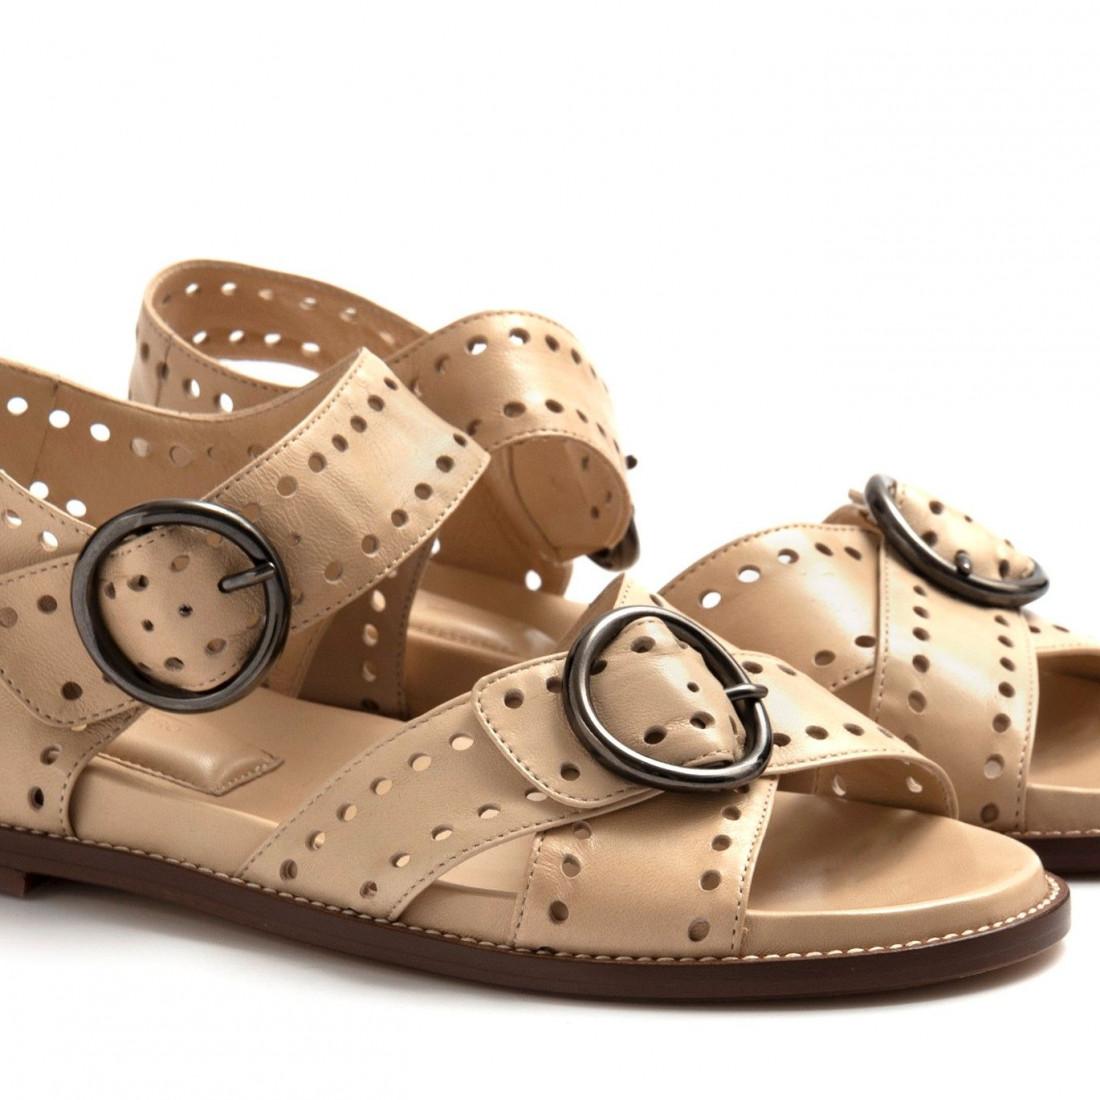 sandals woman lorenzo masiero 192744abb coco 8314